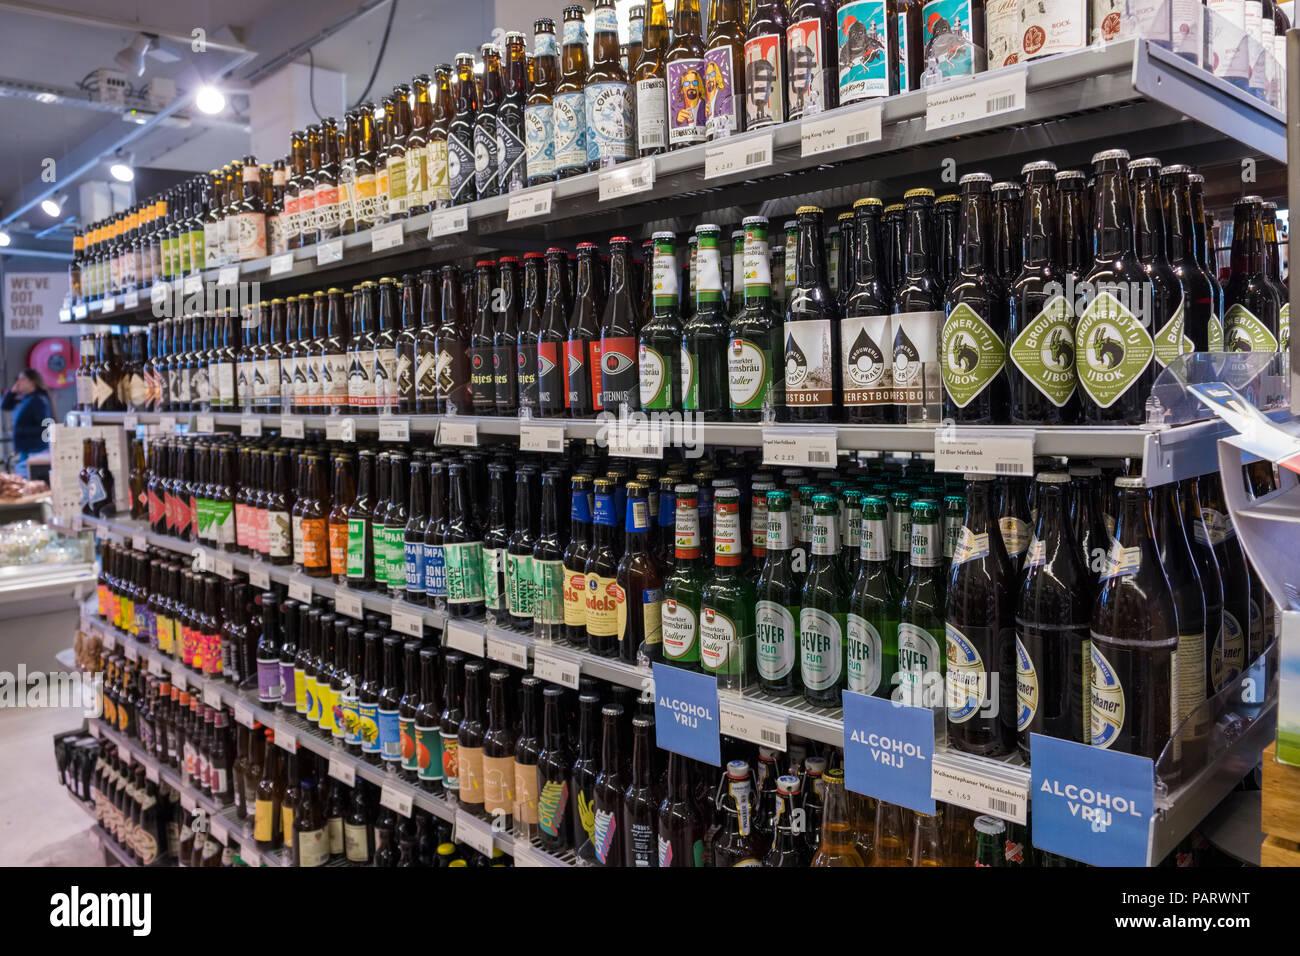 Beer bottles on the shelves of an Amsterdam supermarket, Netherlands, Europe - Stock Image